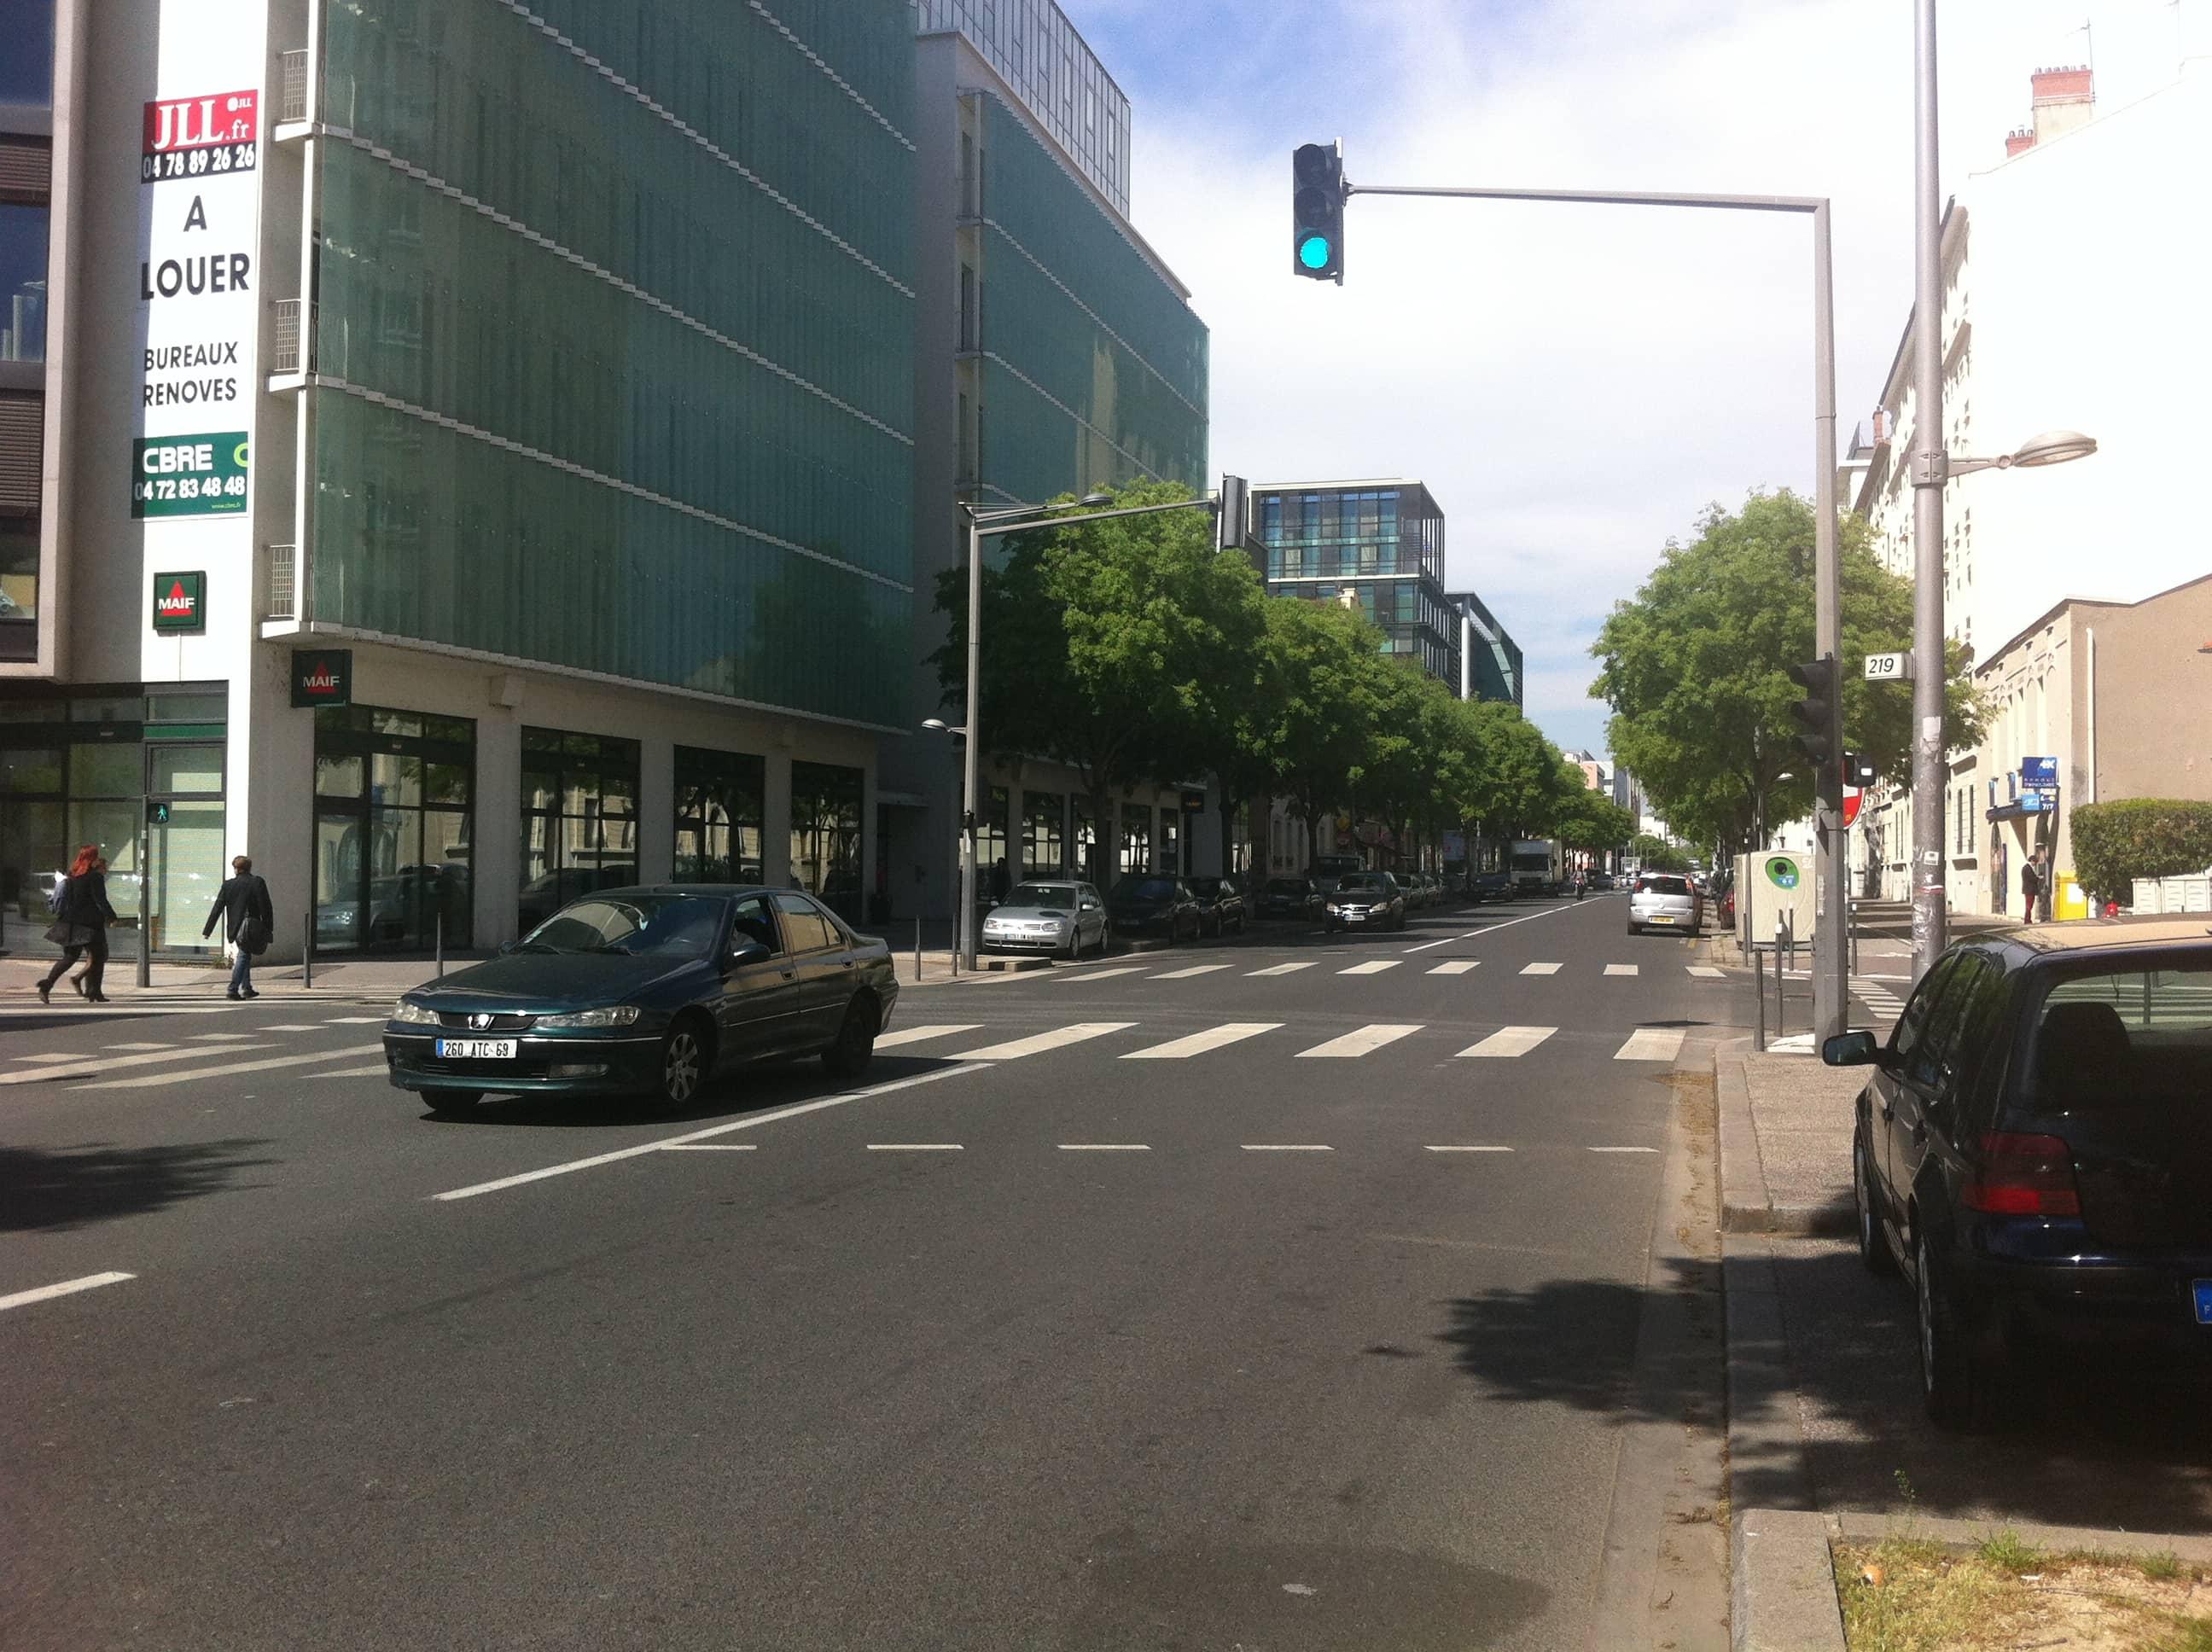 Avenue jean jaur s rue89lyon for Garage bobigny avenue jean jaures